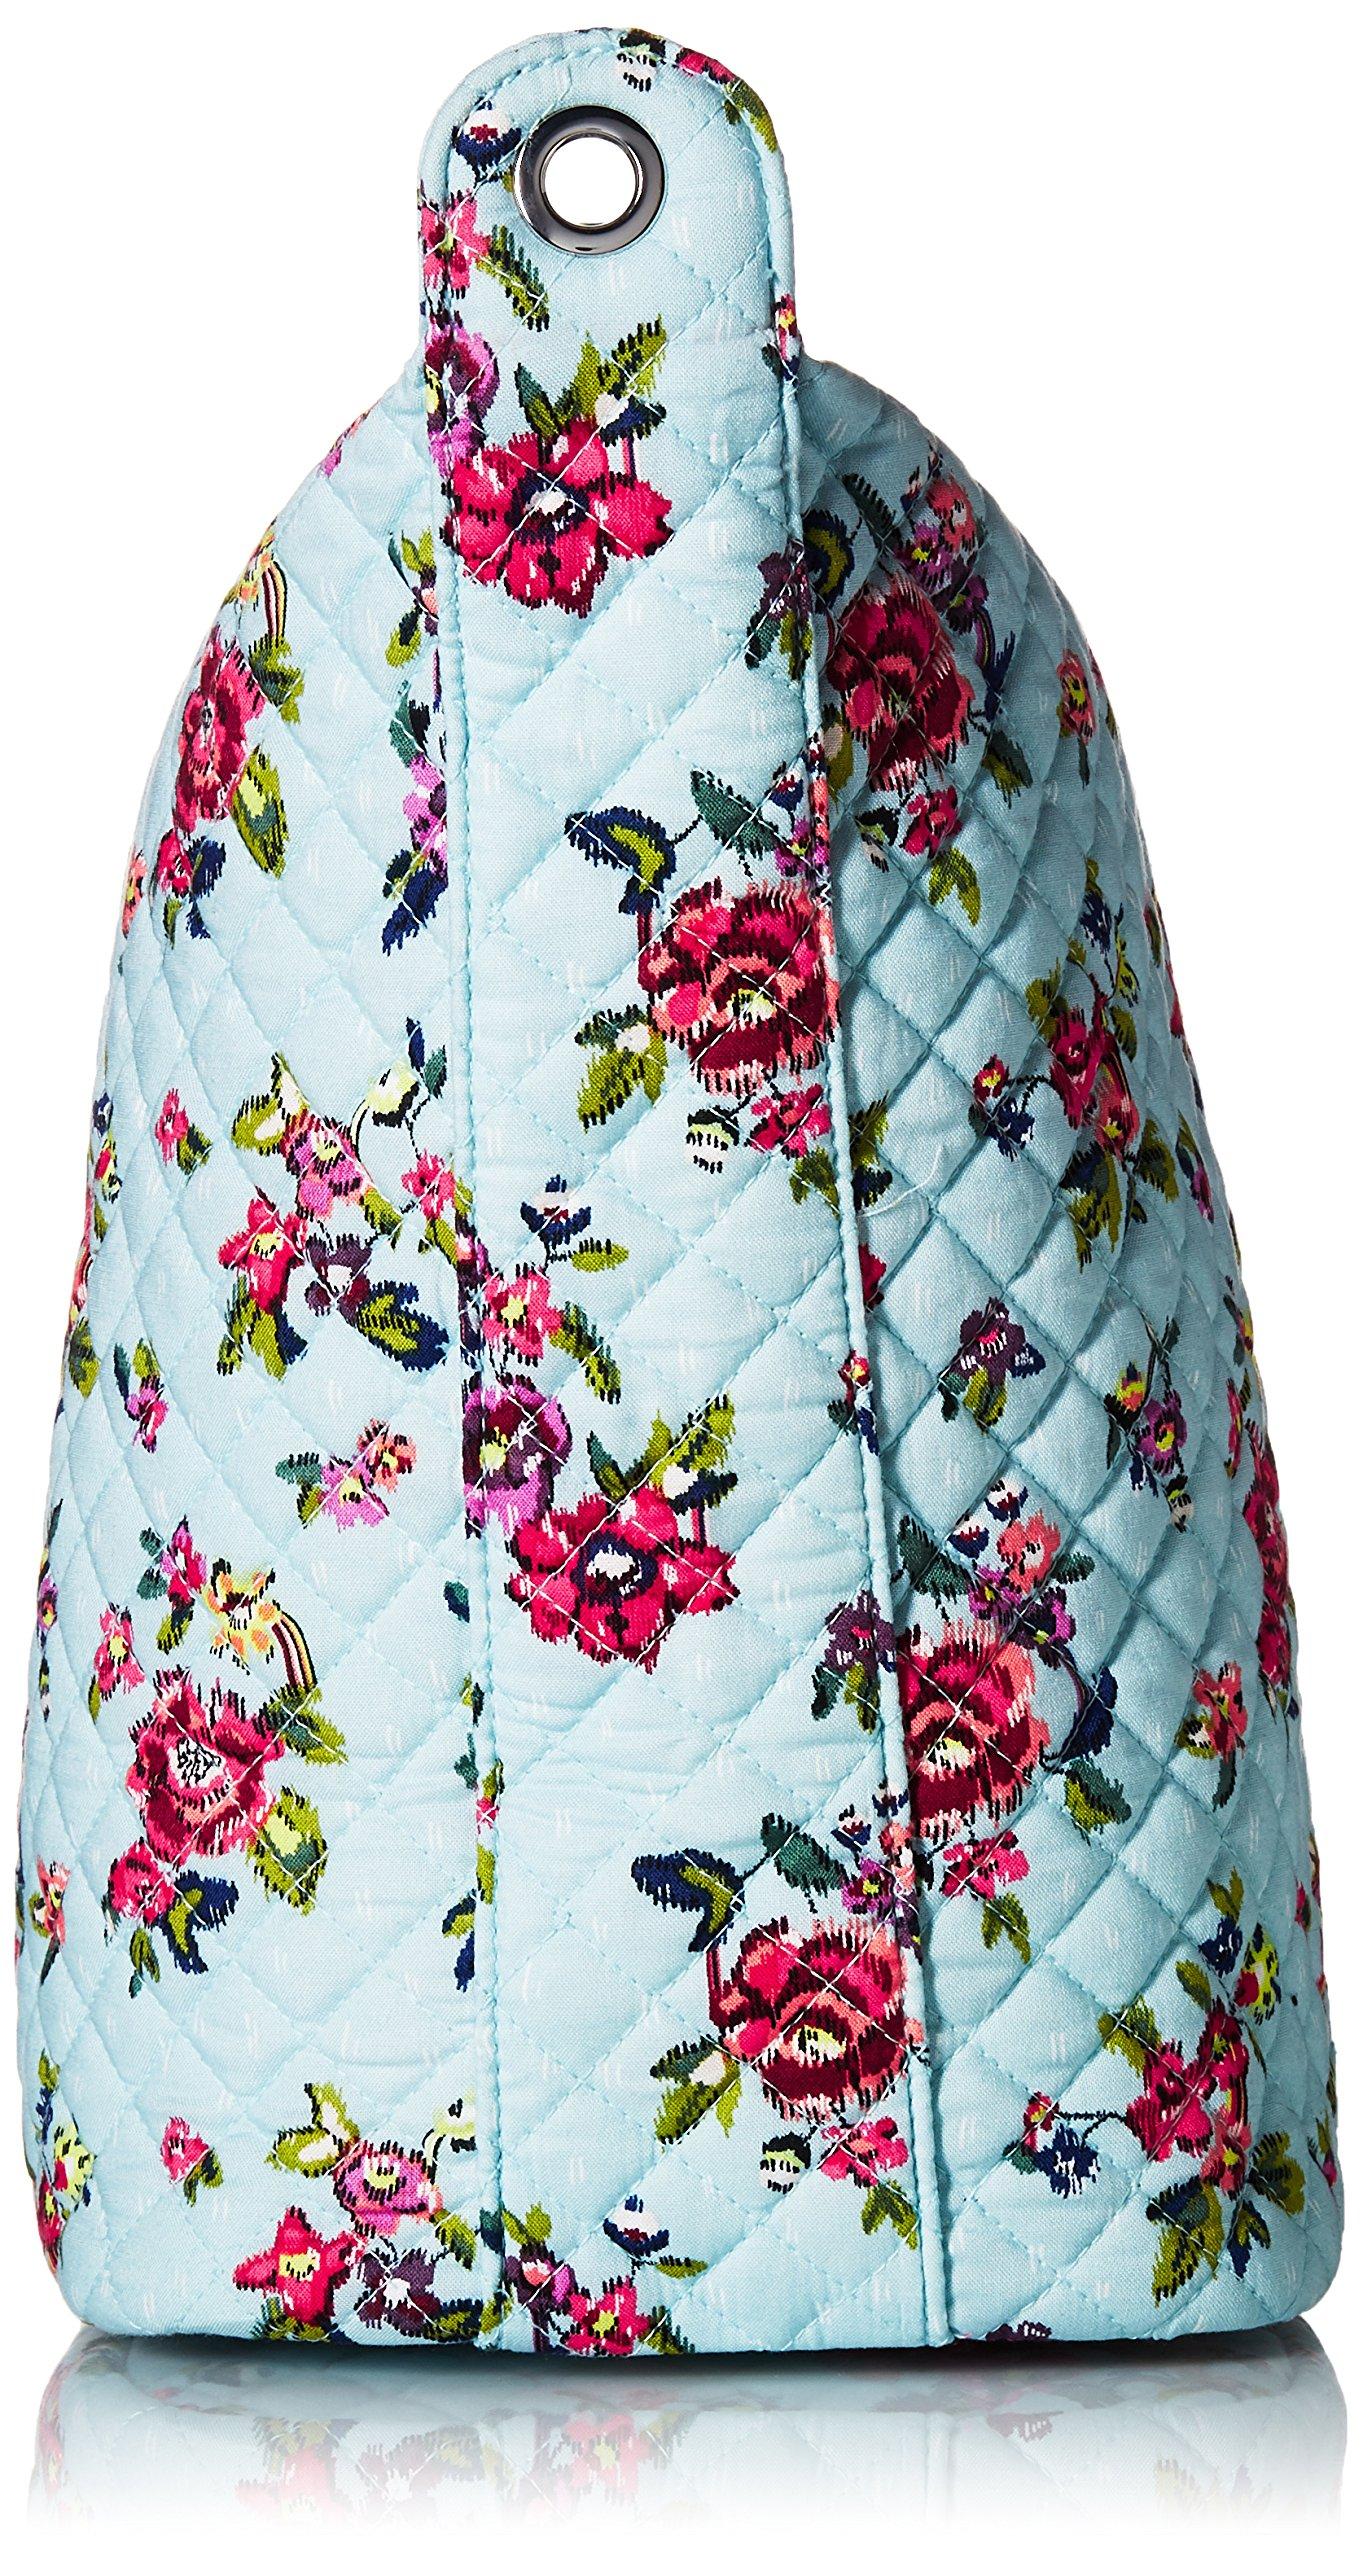 Vera Bradley Carson Hobo Bag, Signature Cotton, Water Bouquet by Vera Bradley (Image #3)